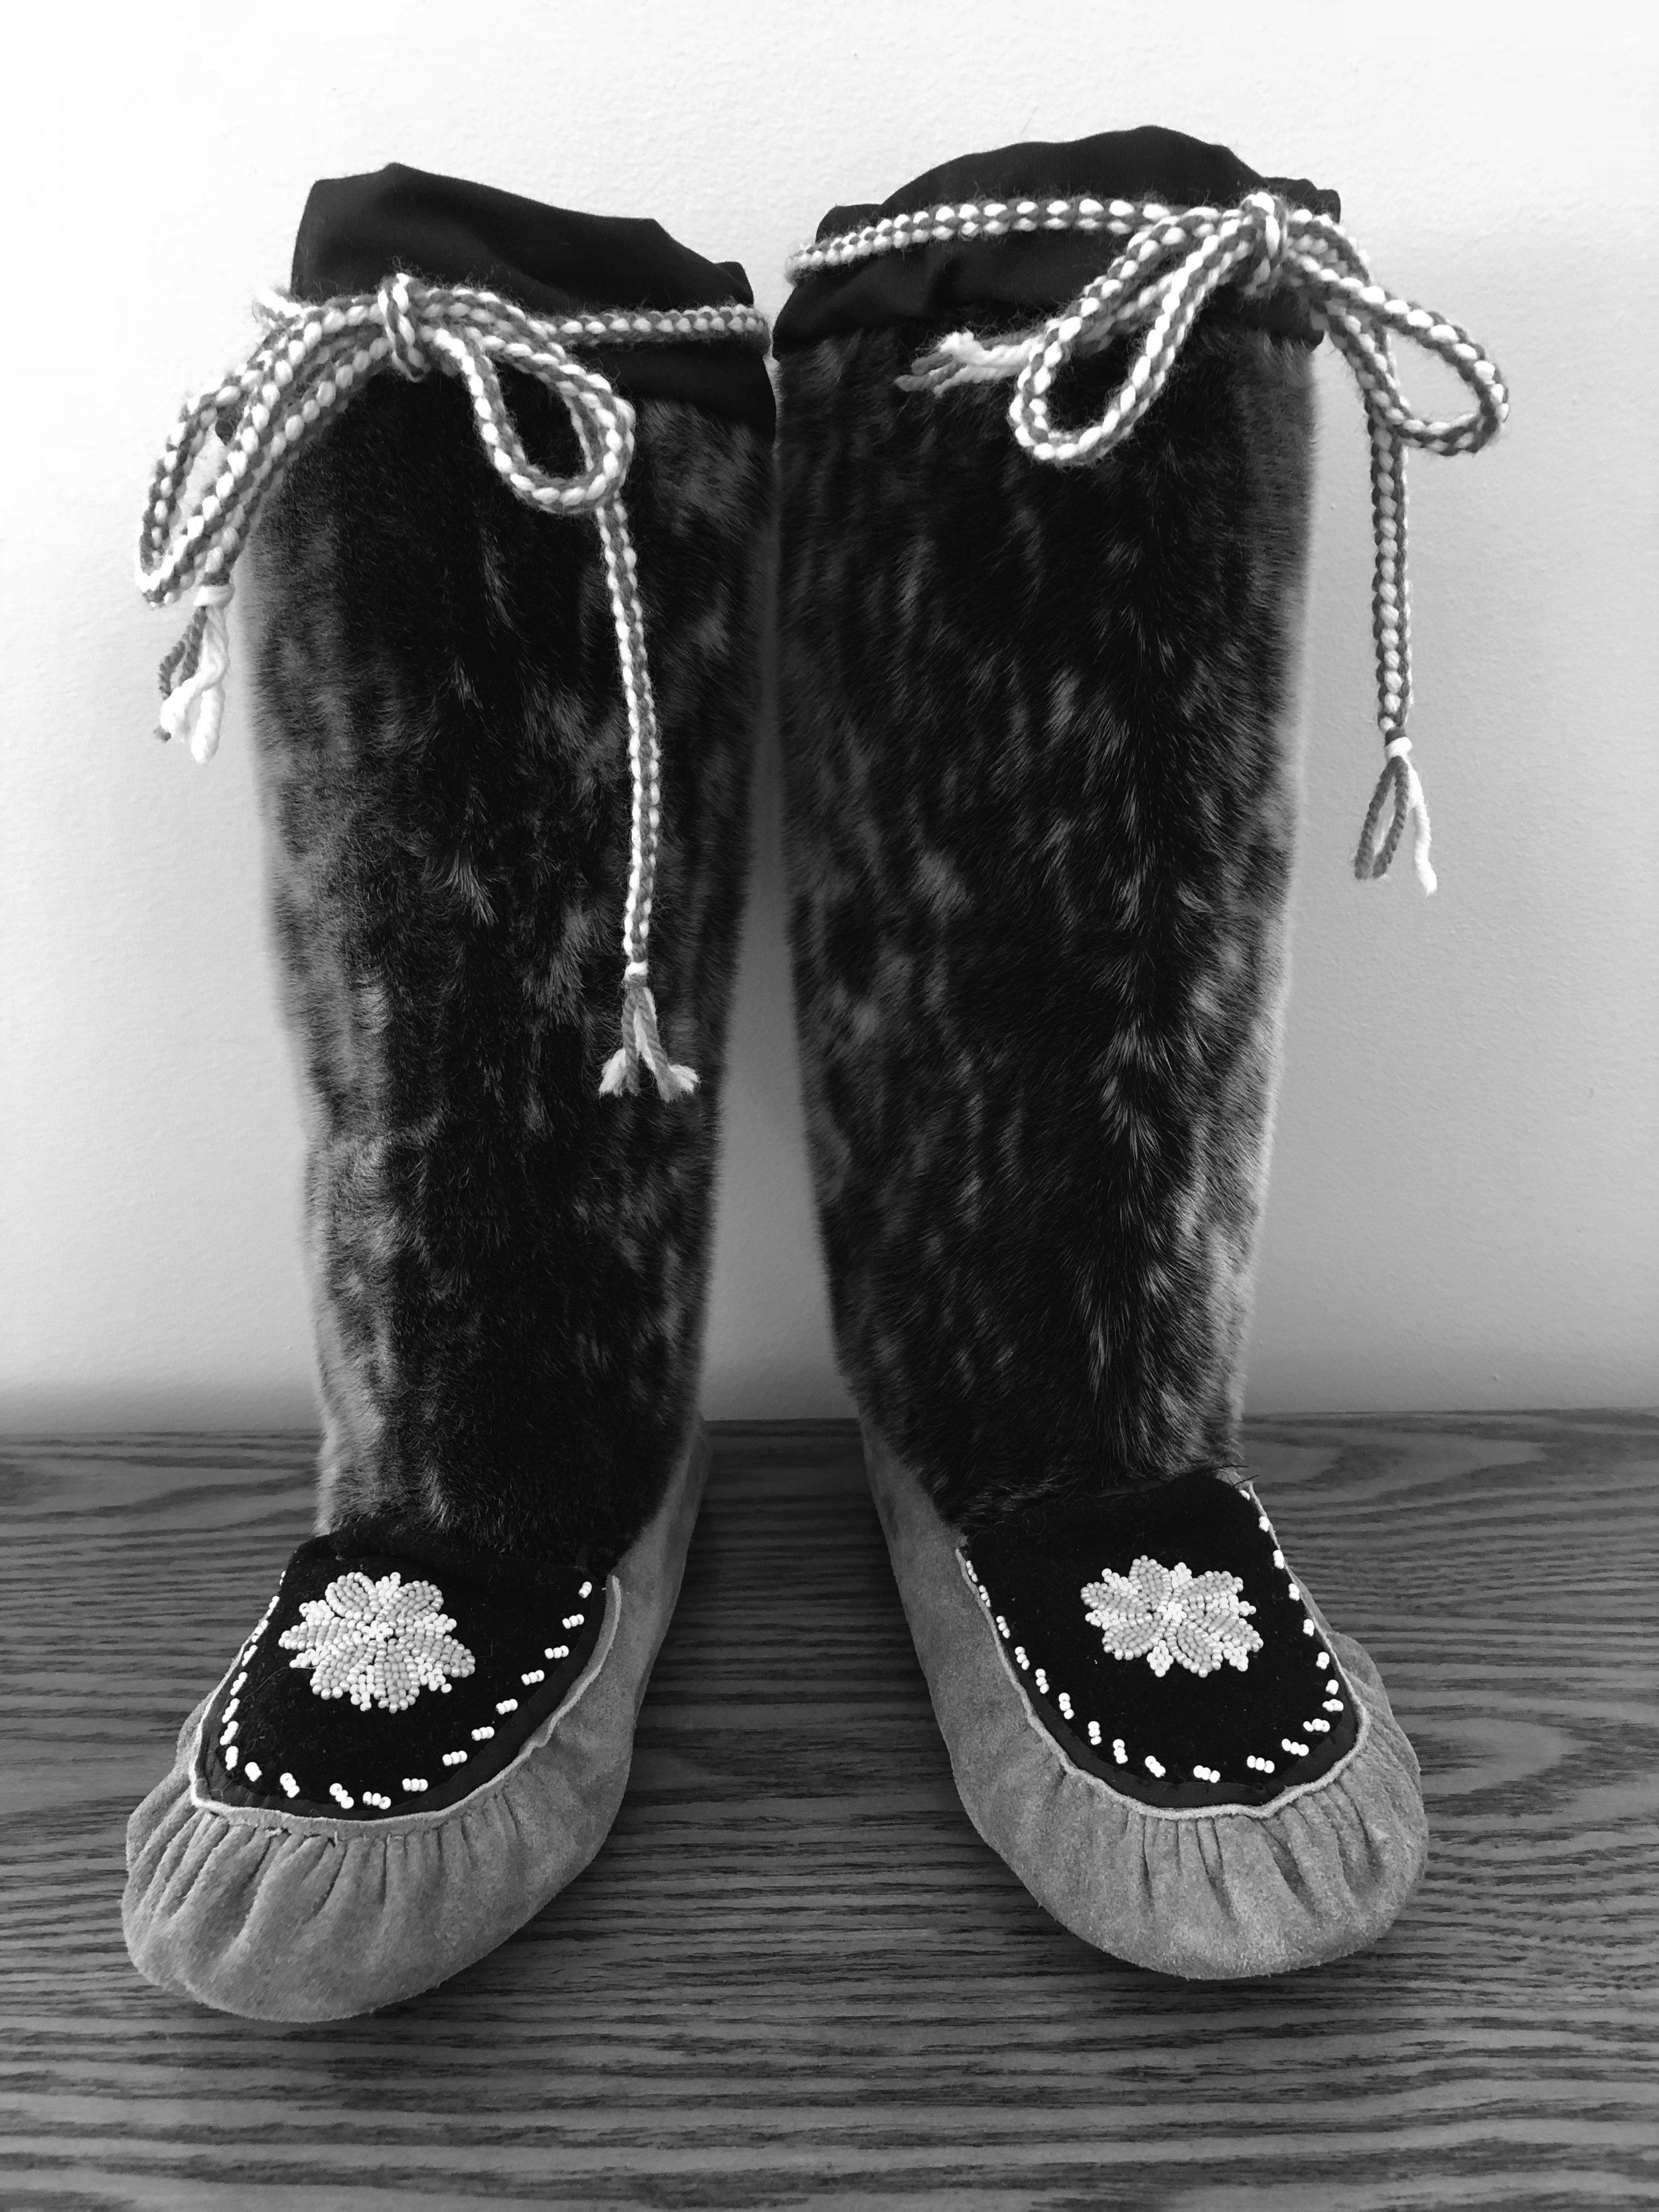 Ladies Sealskin kamik handcrafted by Andrea Flowers of Hopedale, Nunatsiavut.